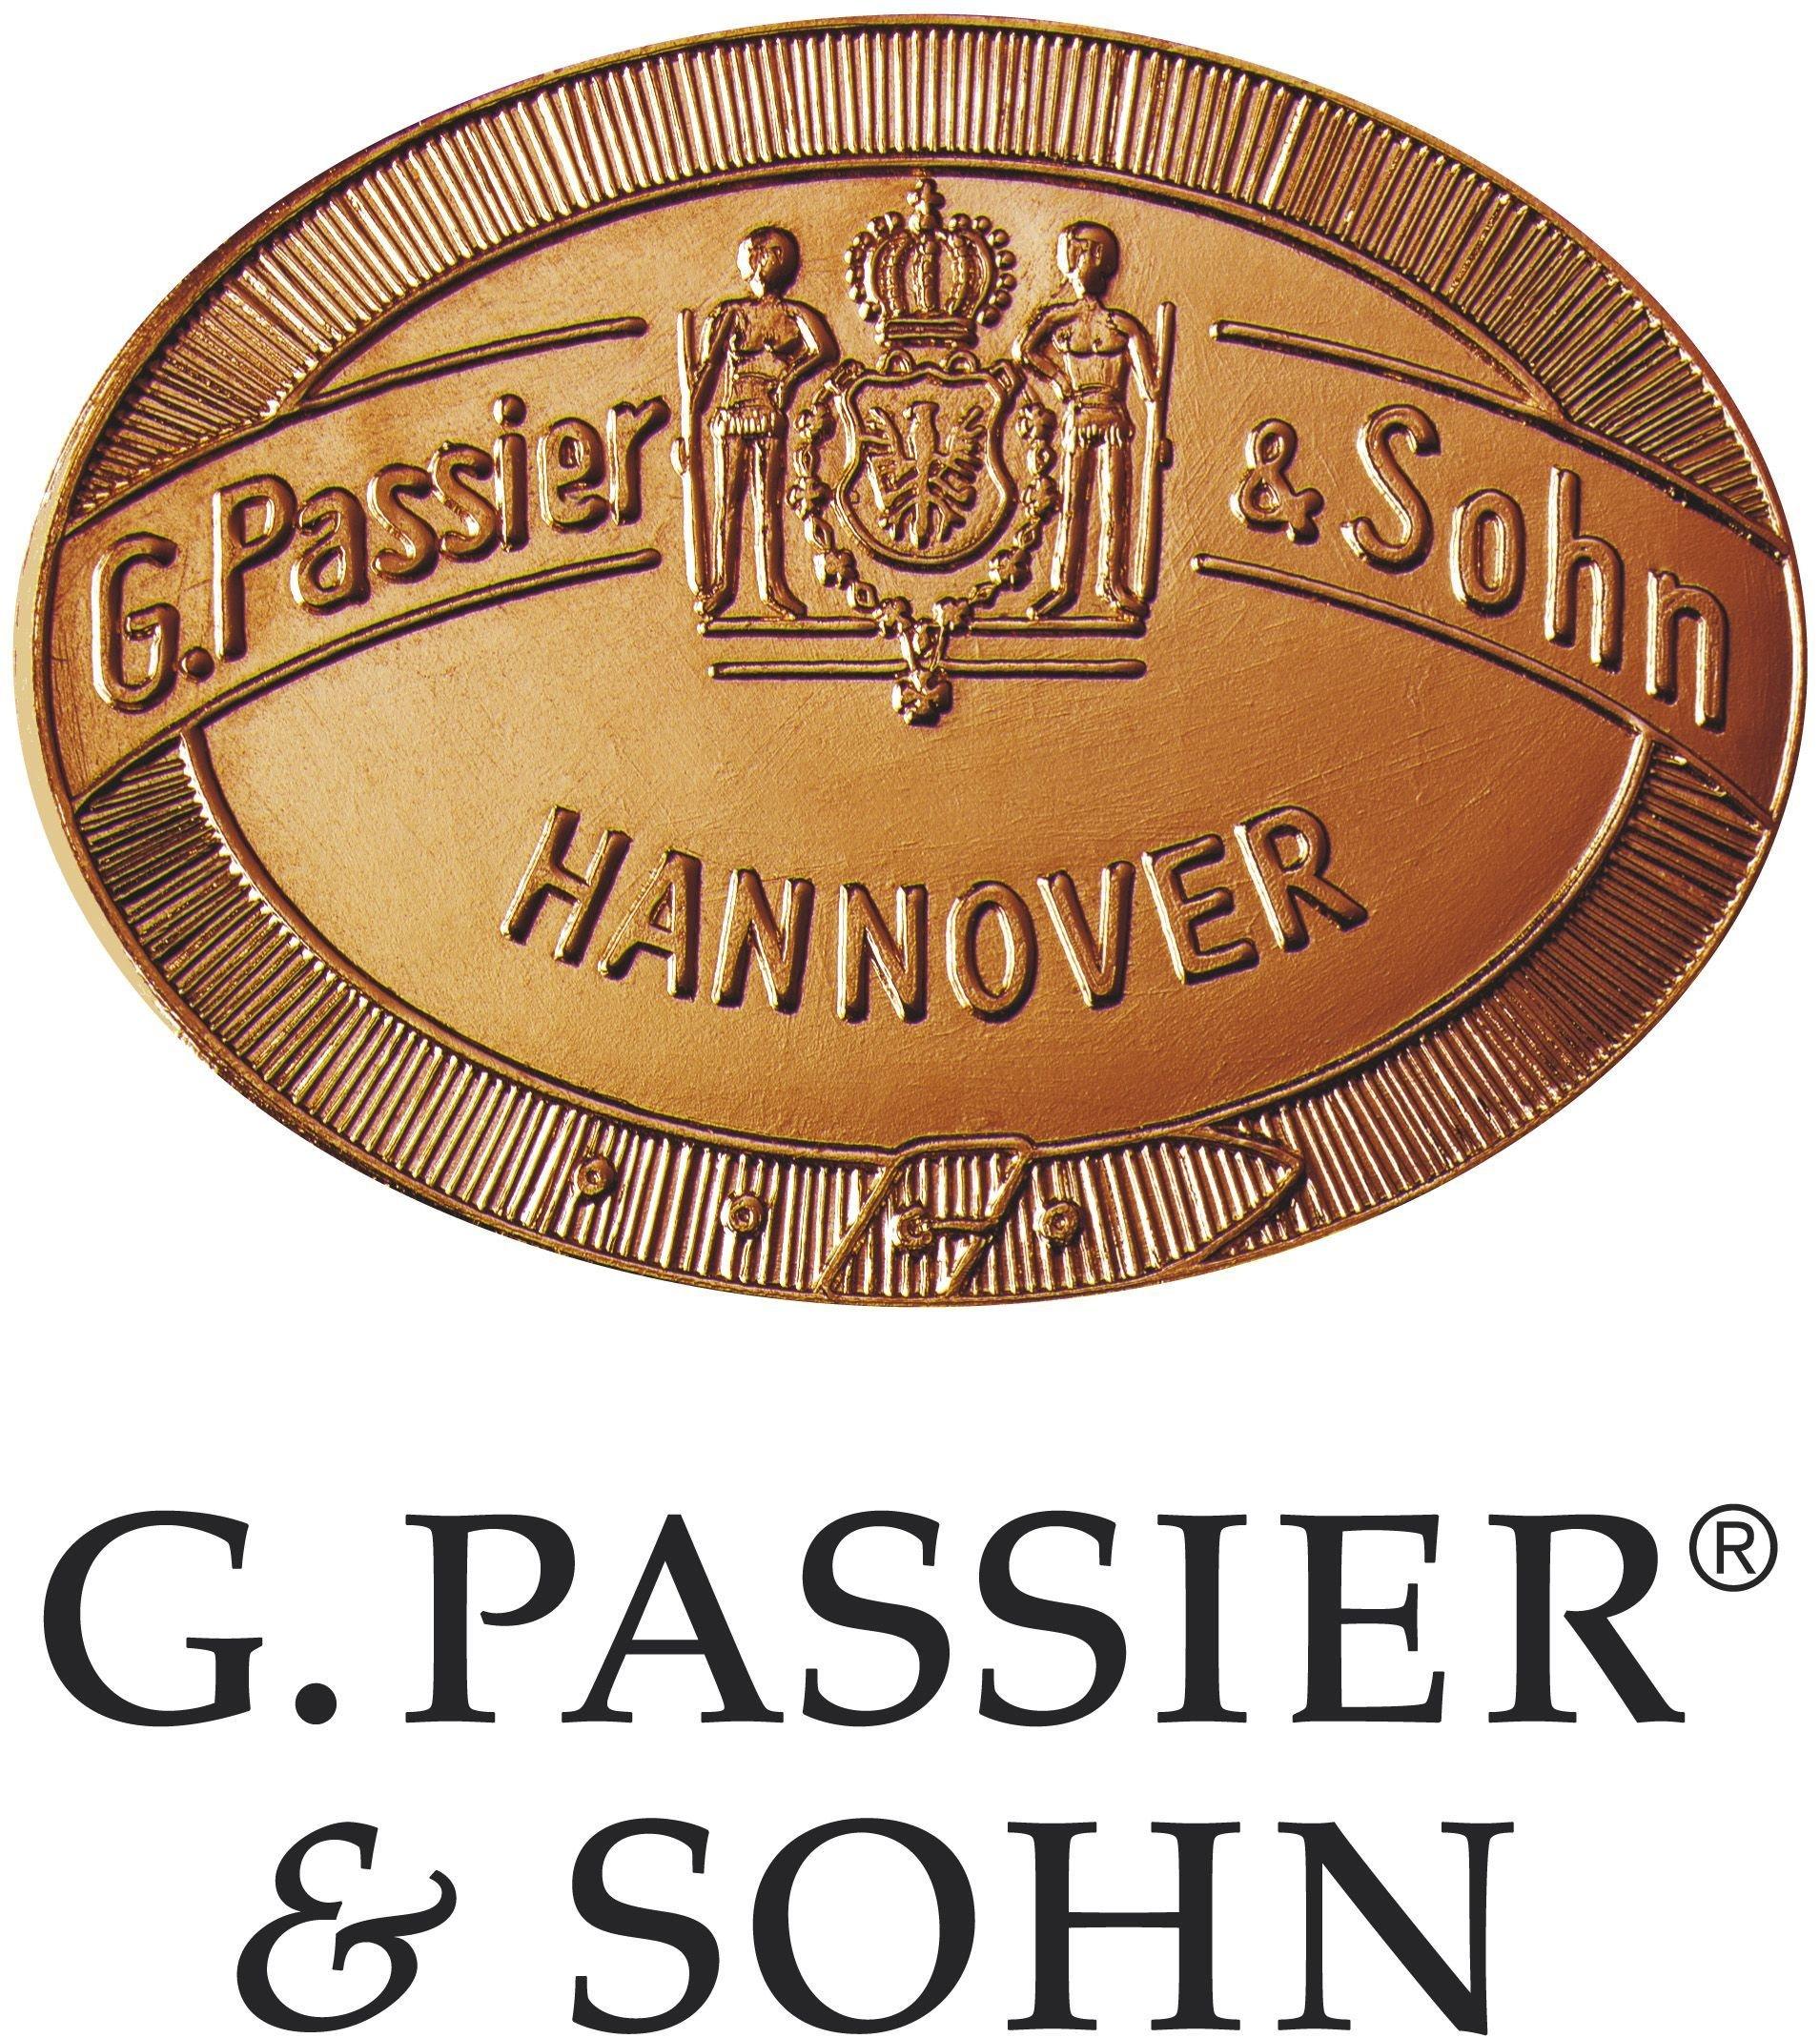 Passier